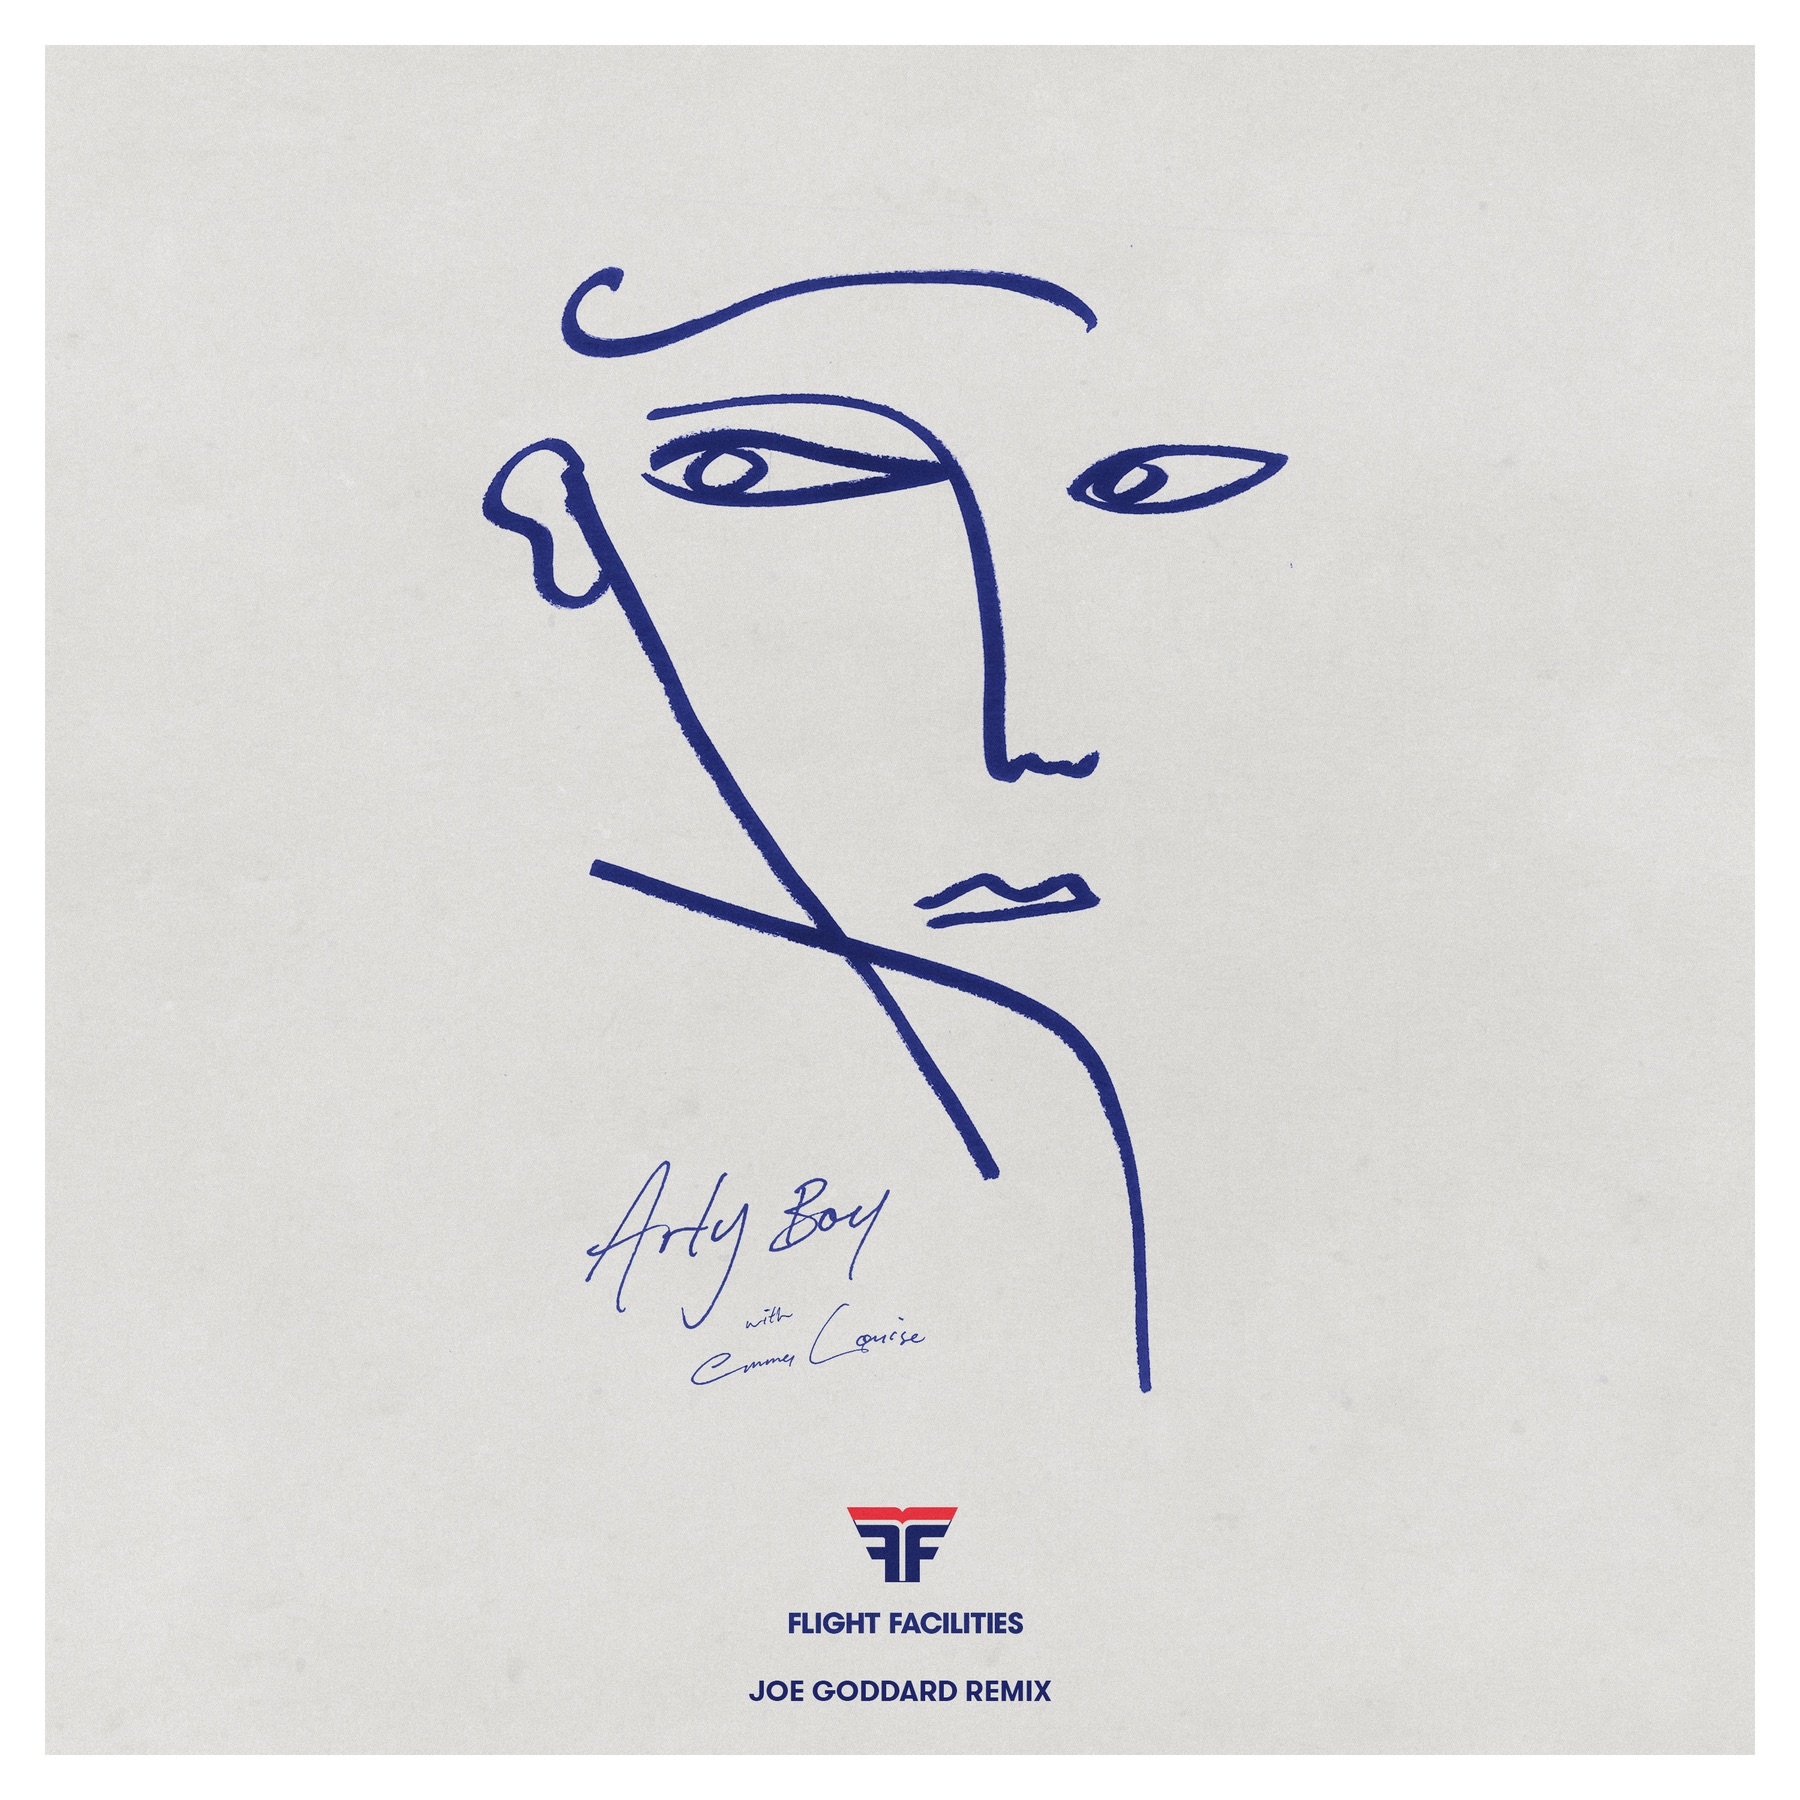 Arty Boy (feat. Emma Louise) [Joe Goddard Remix] - Single